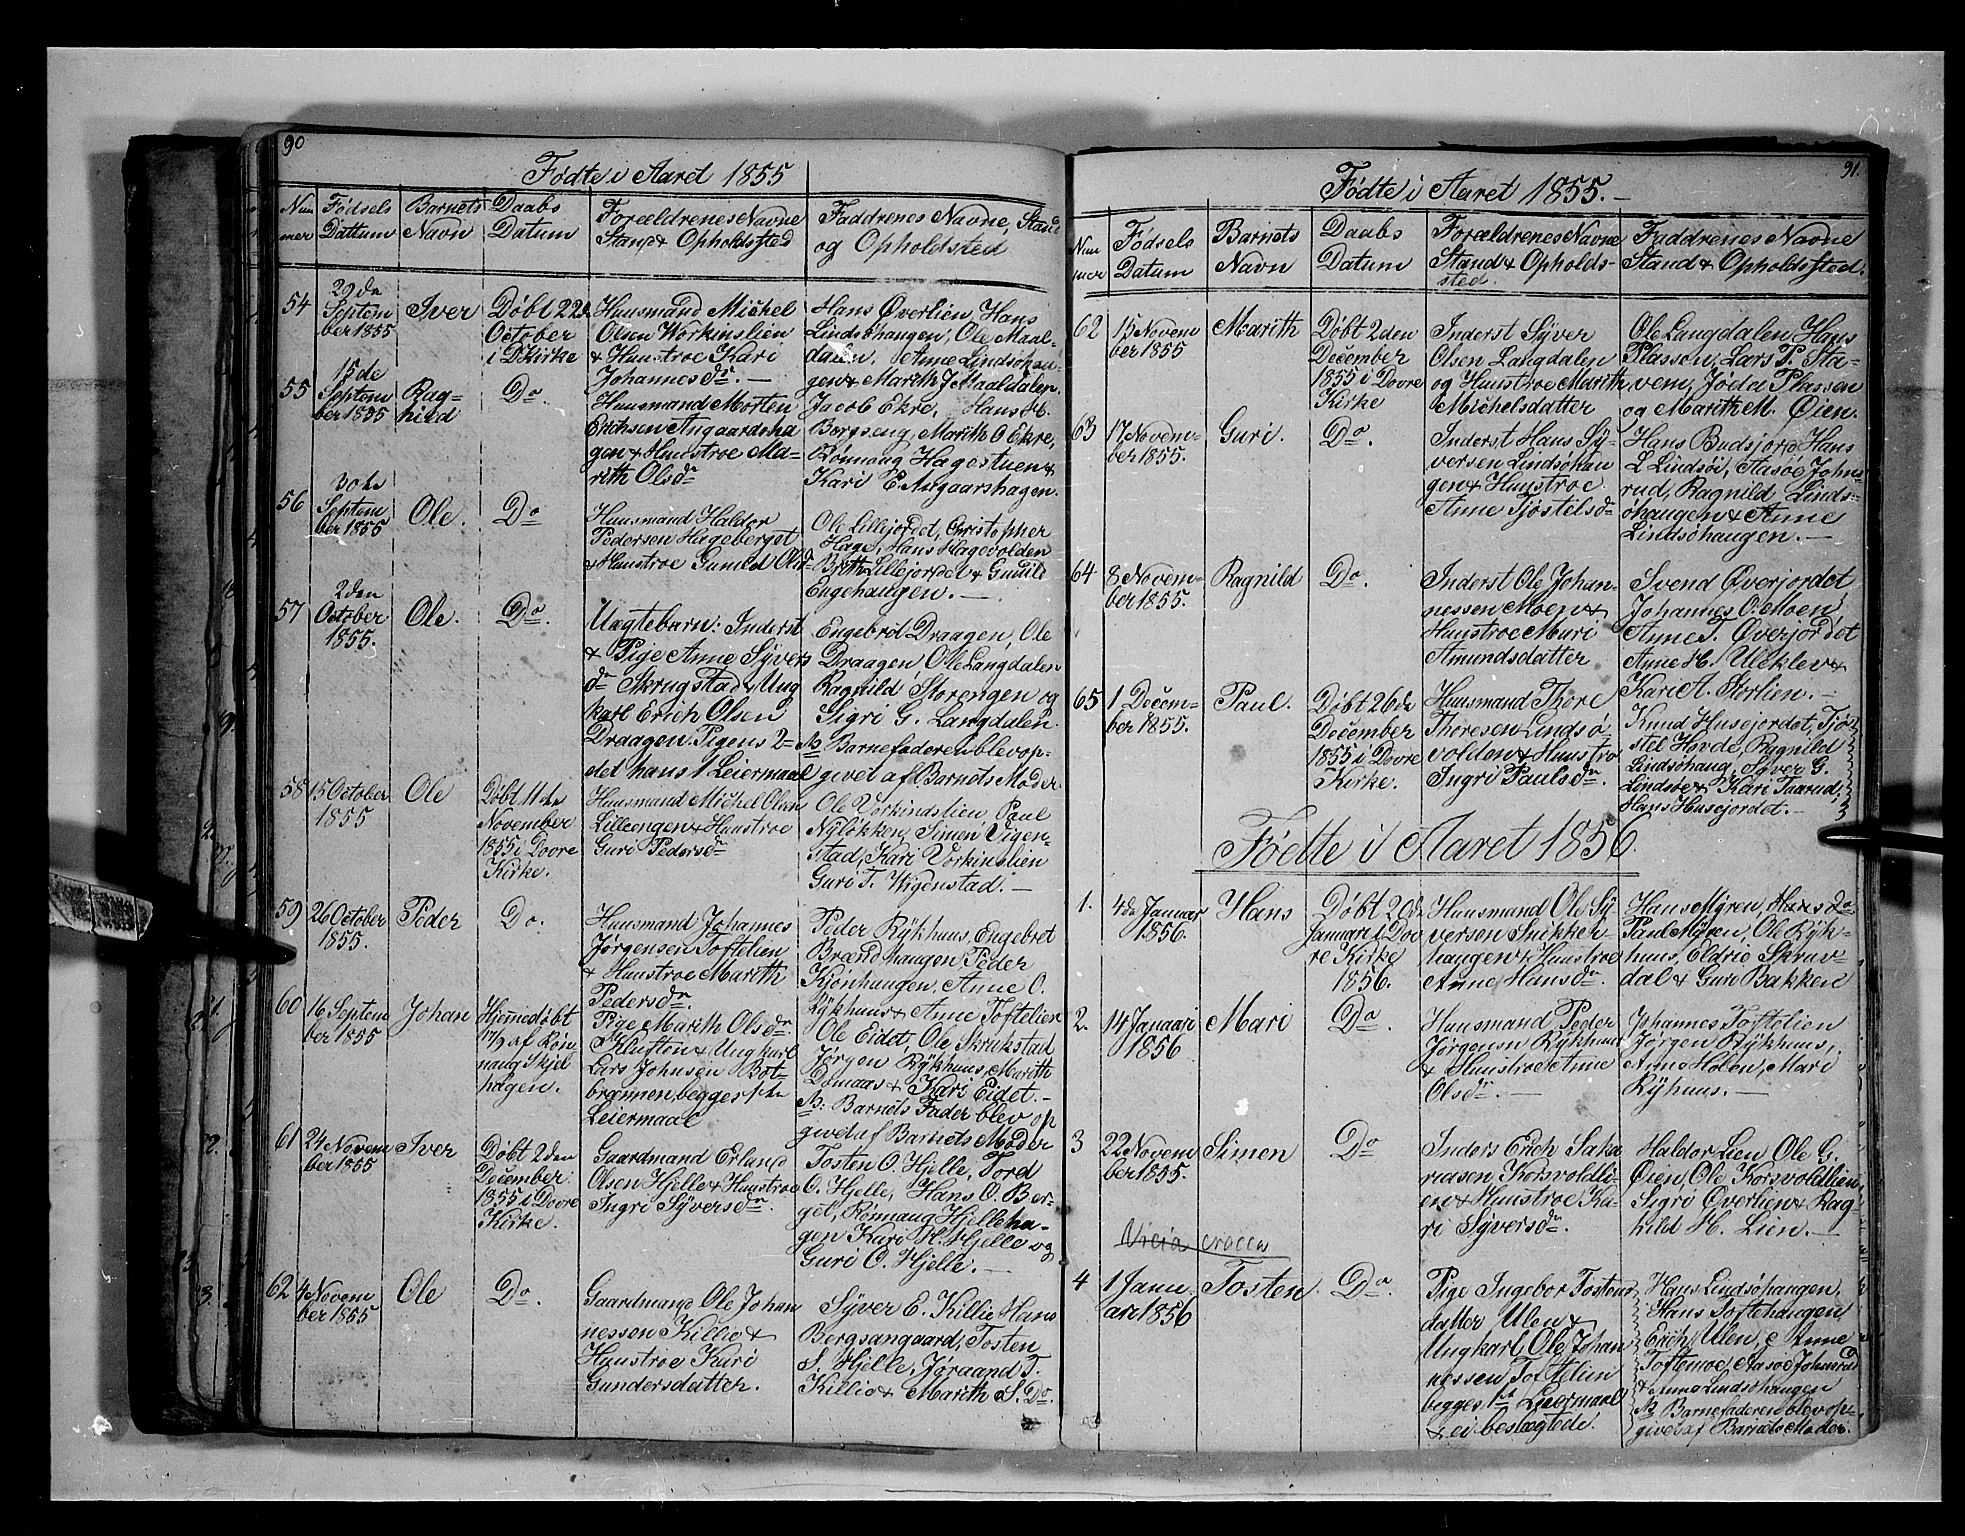 SAH, Lesja prestekontor, Klokkerbok nr. 3, 1842-1862, s. 90-91